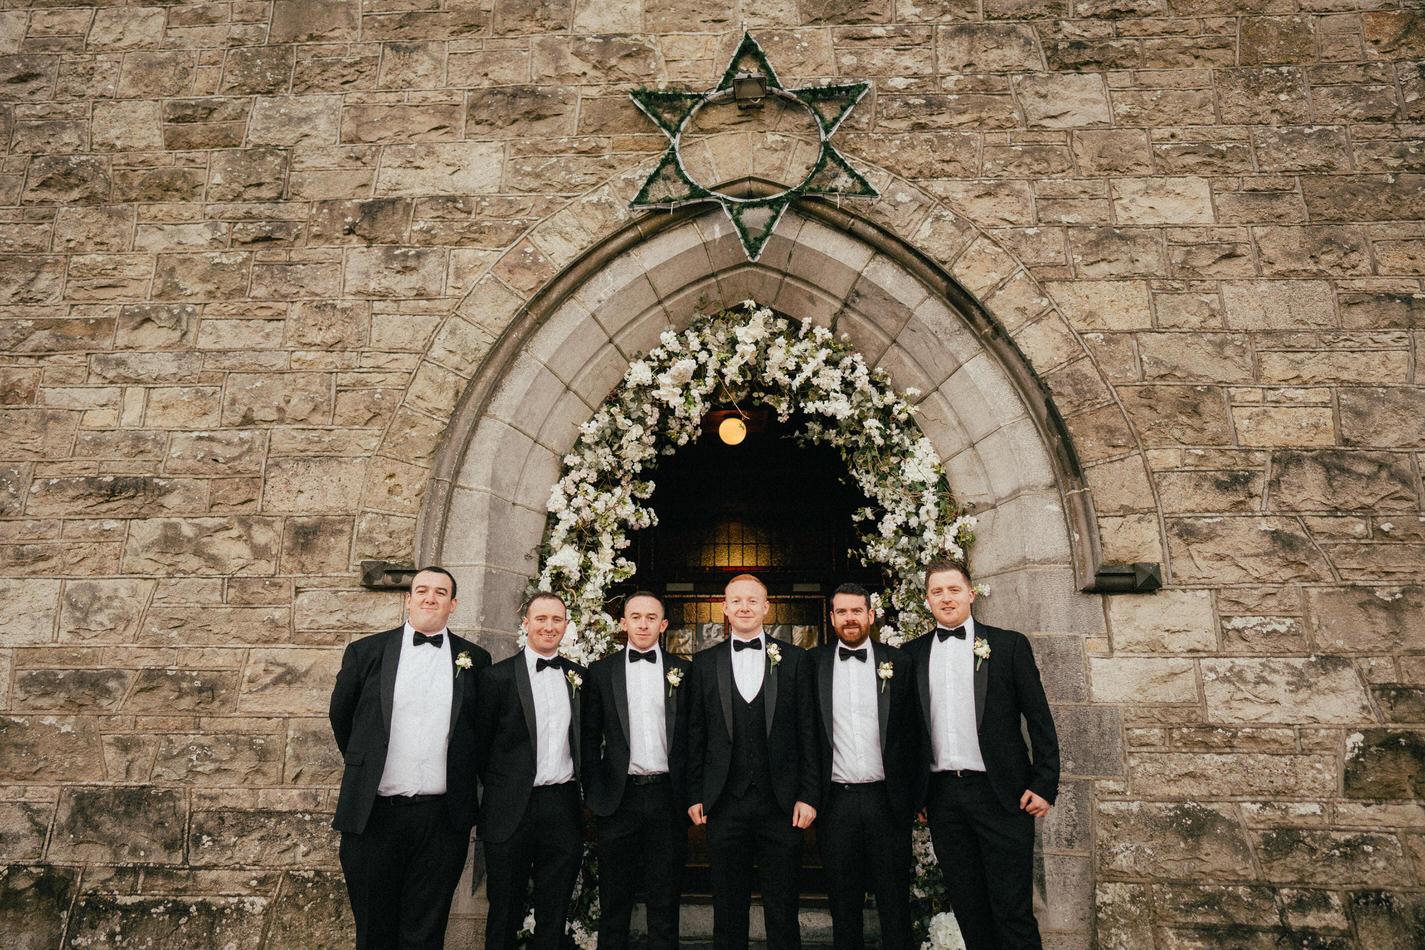 Castle-wedding-ireland-photos- 0090 61